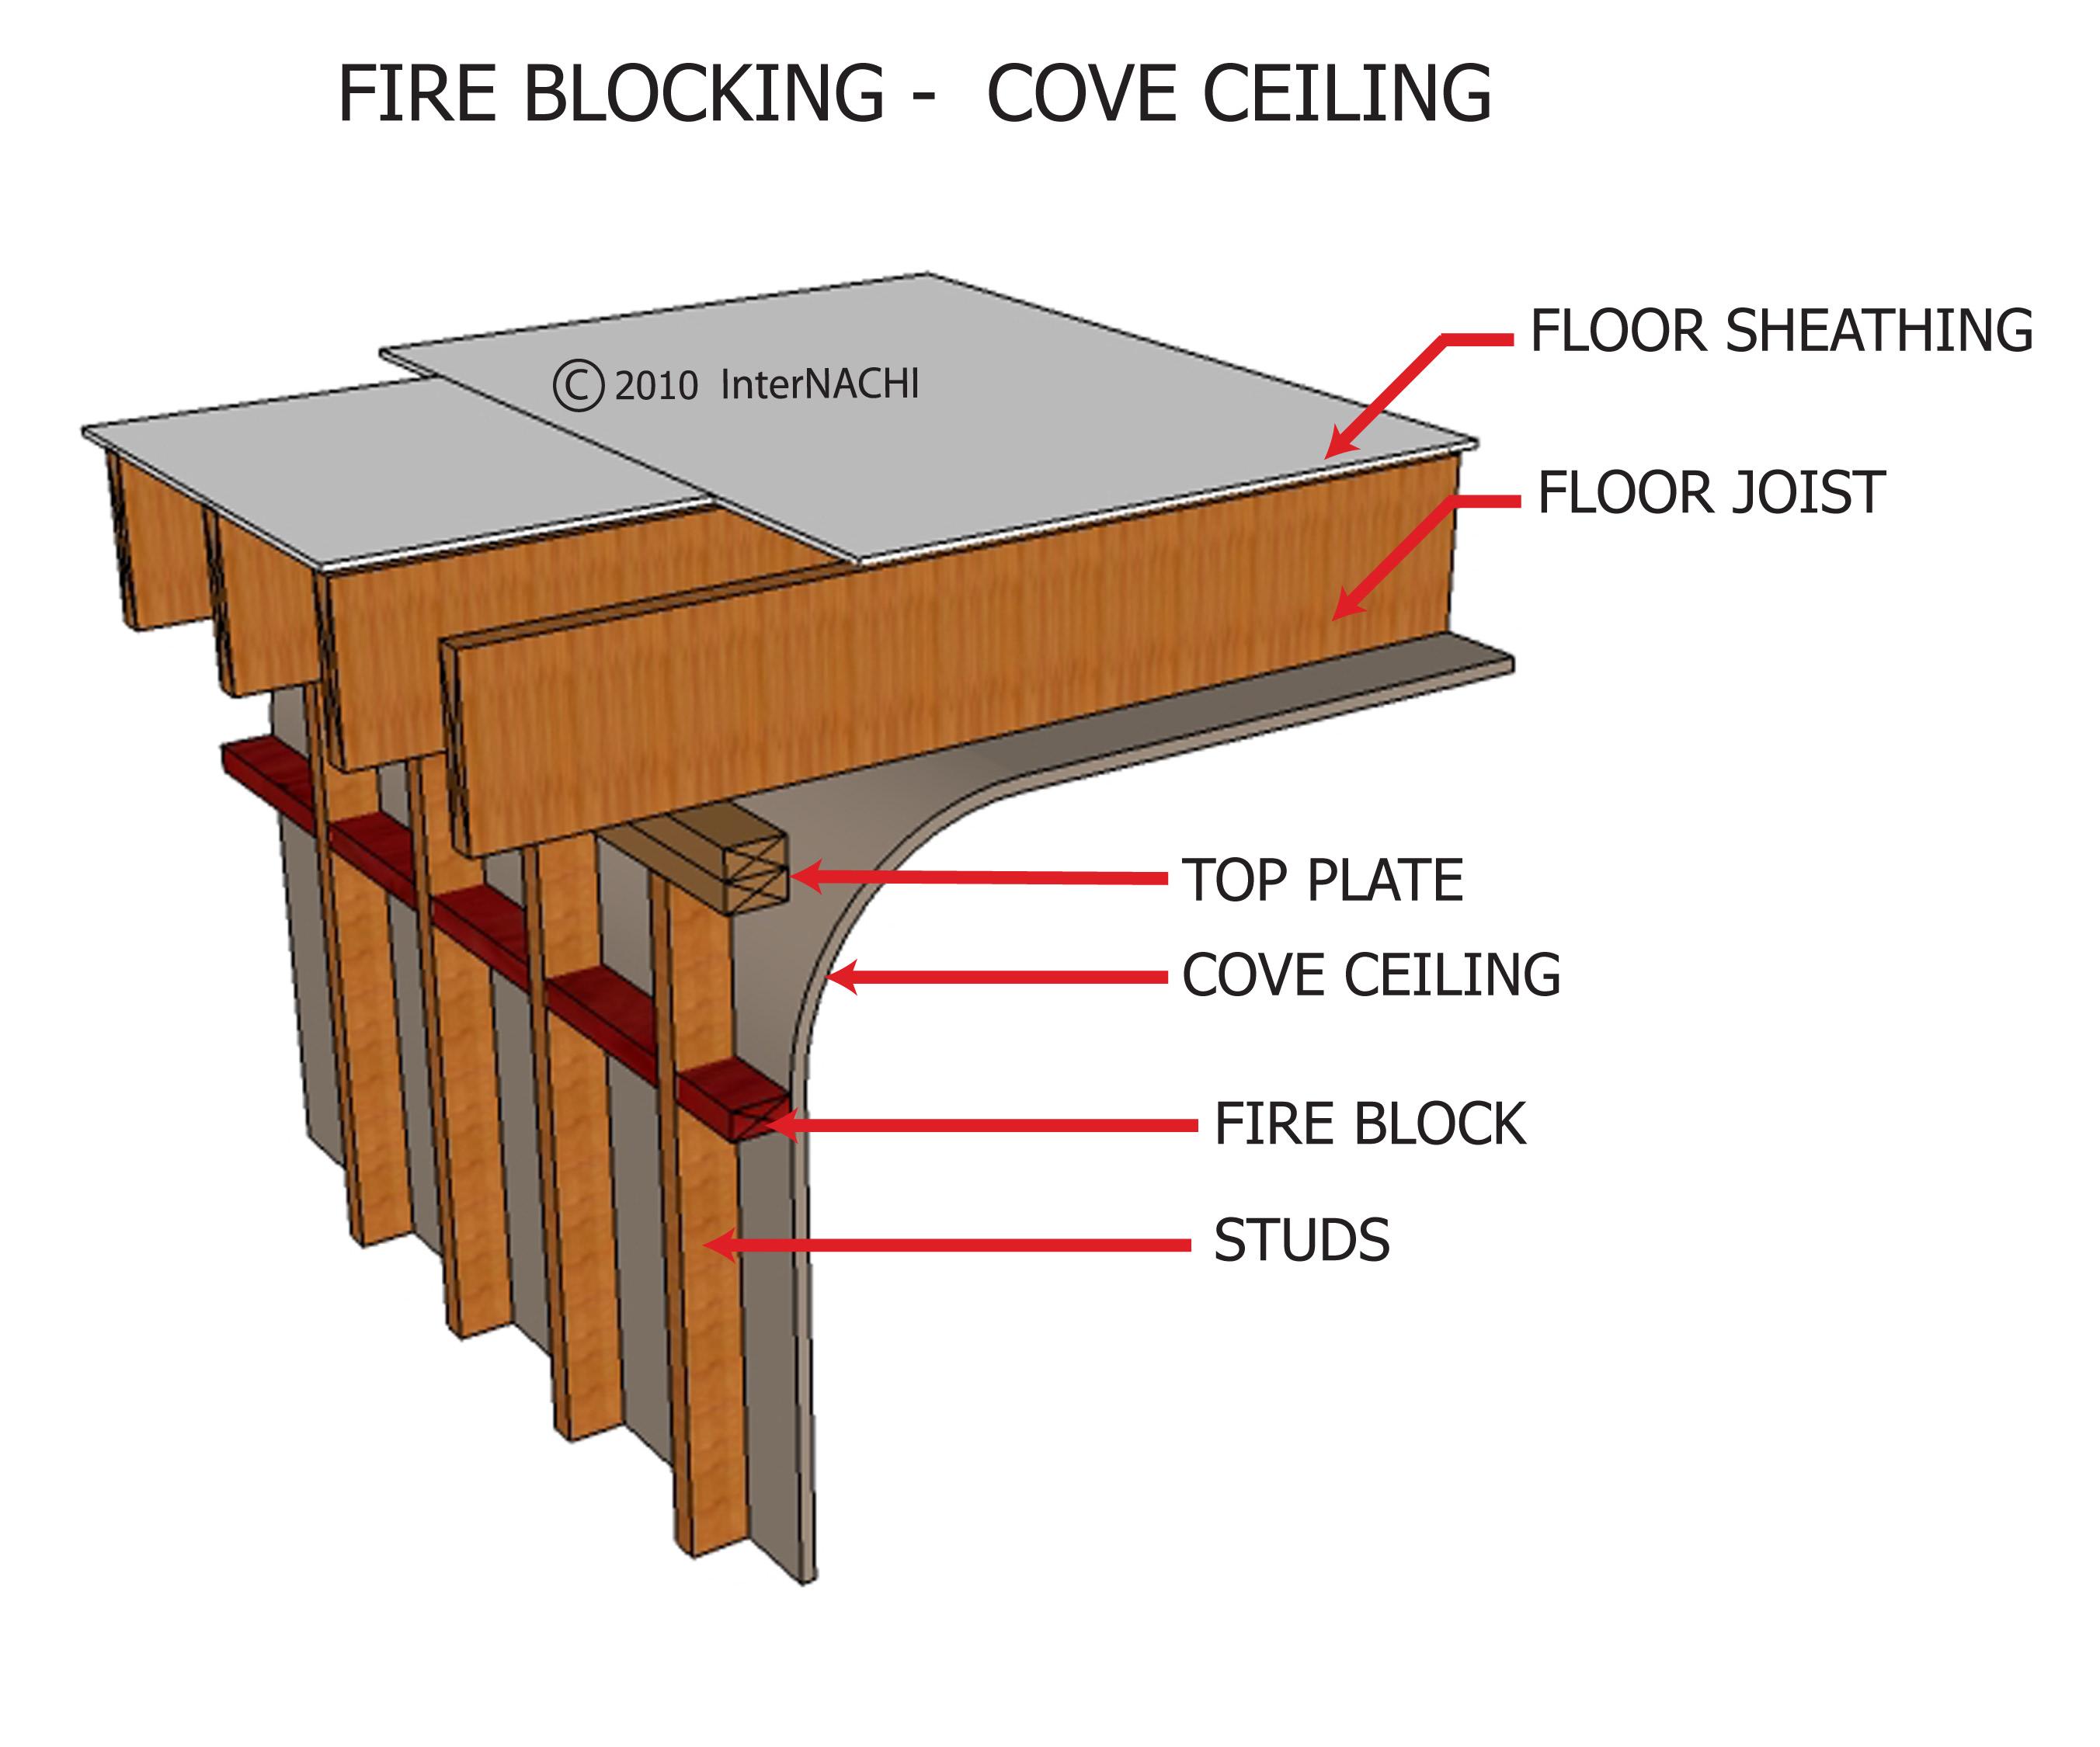 Fire Blocking - Cove Ceiling